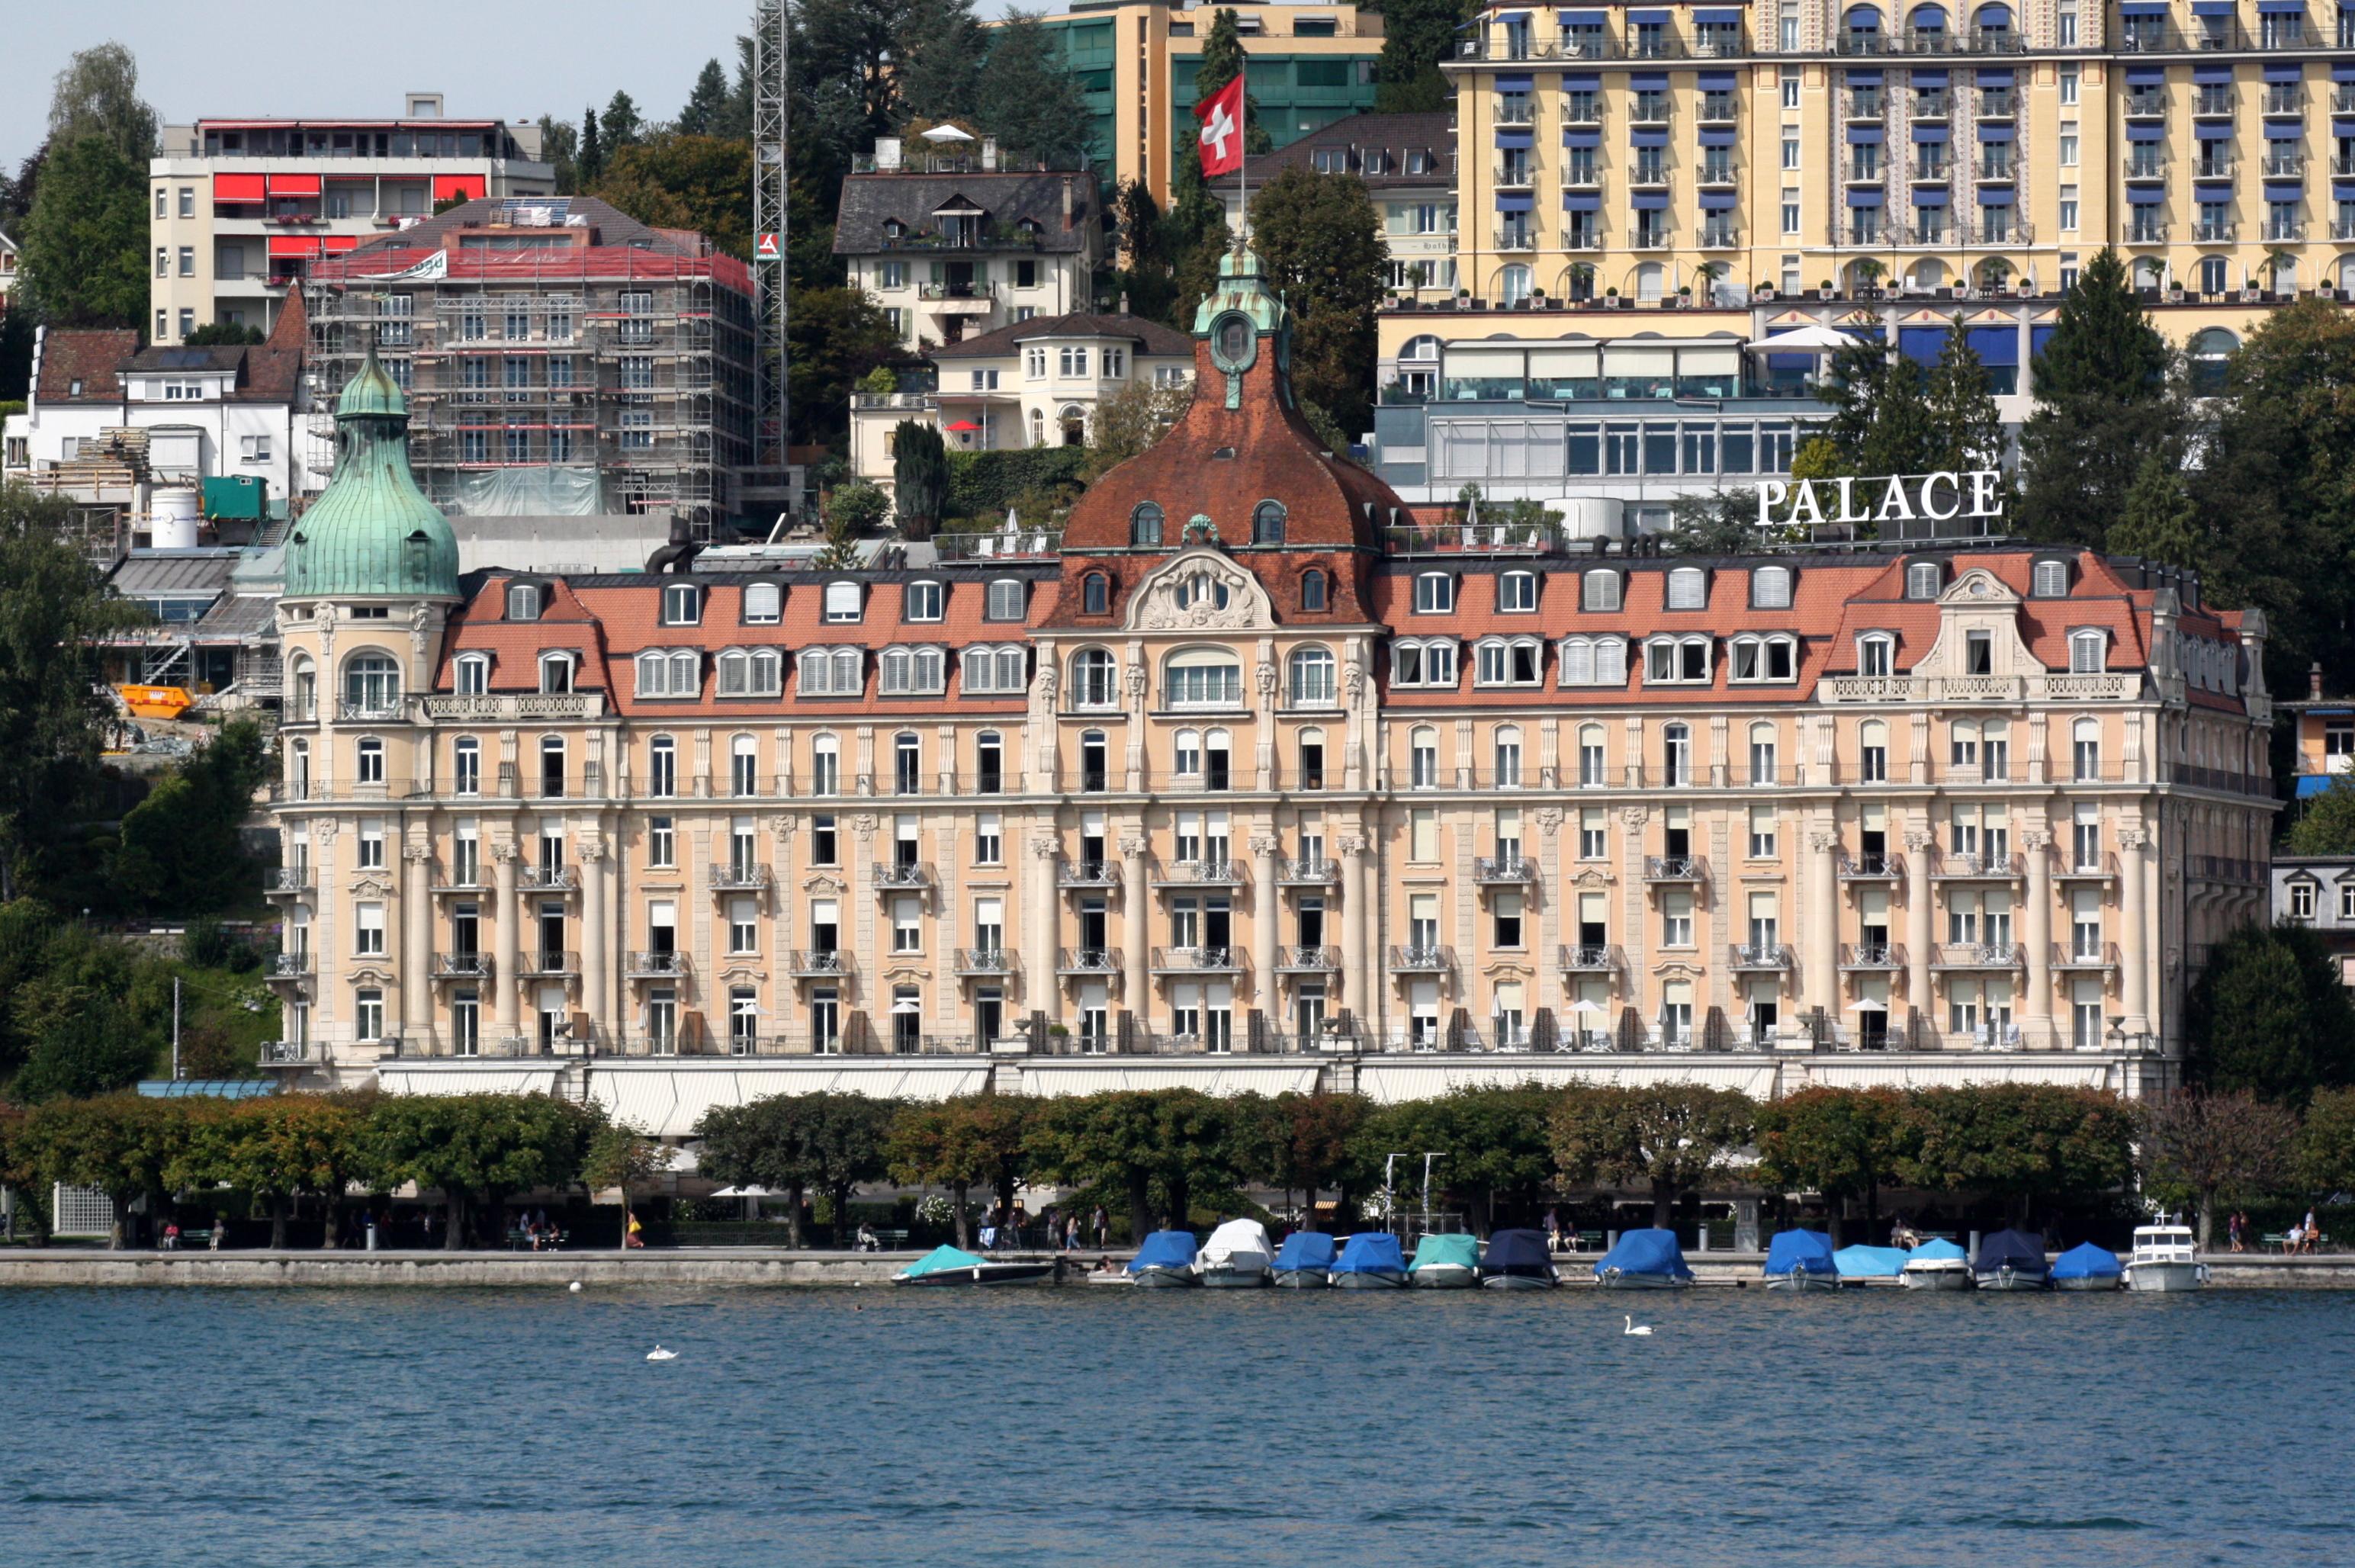 Hotel Casino Luzern